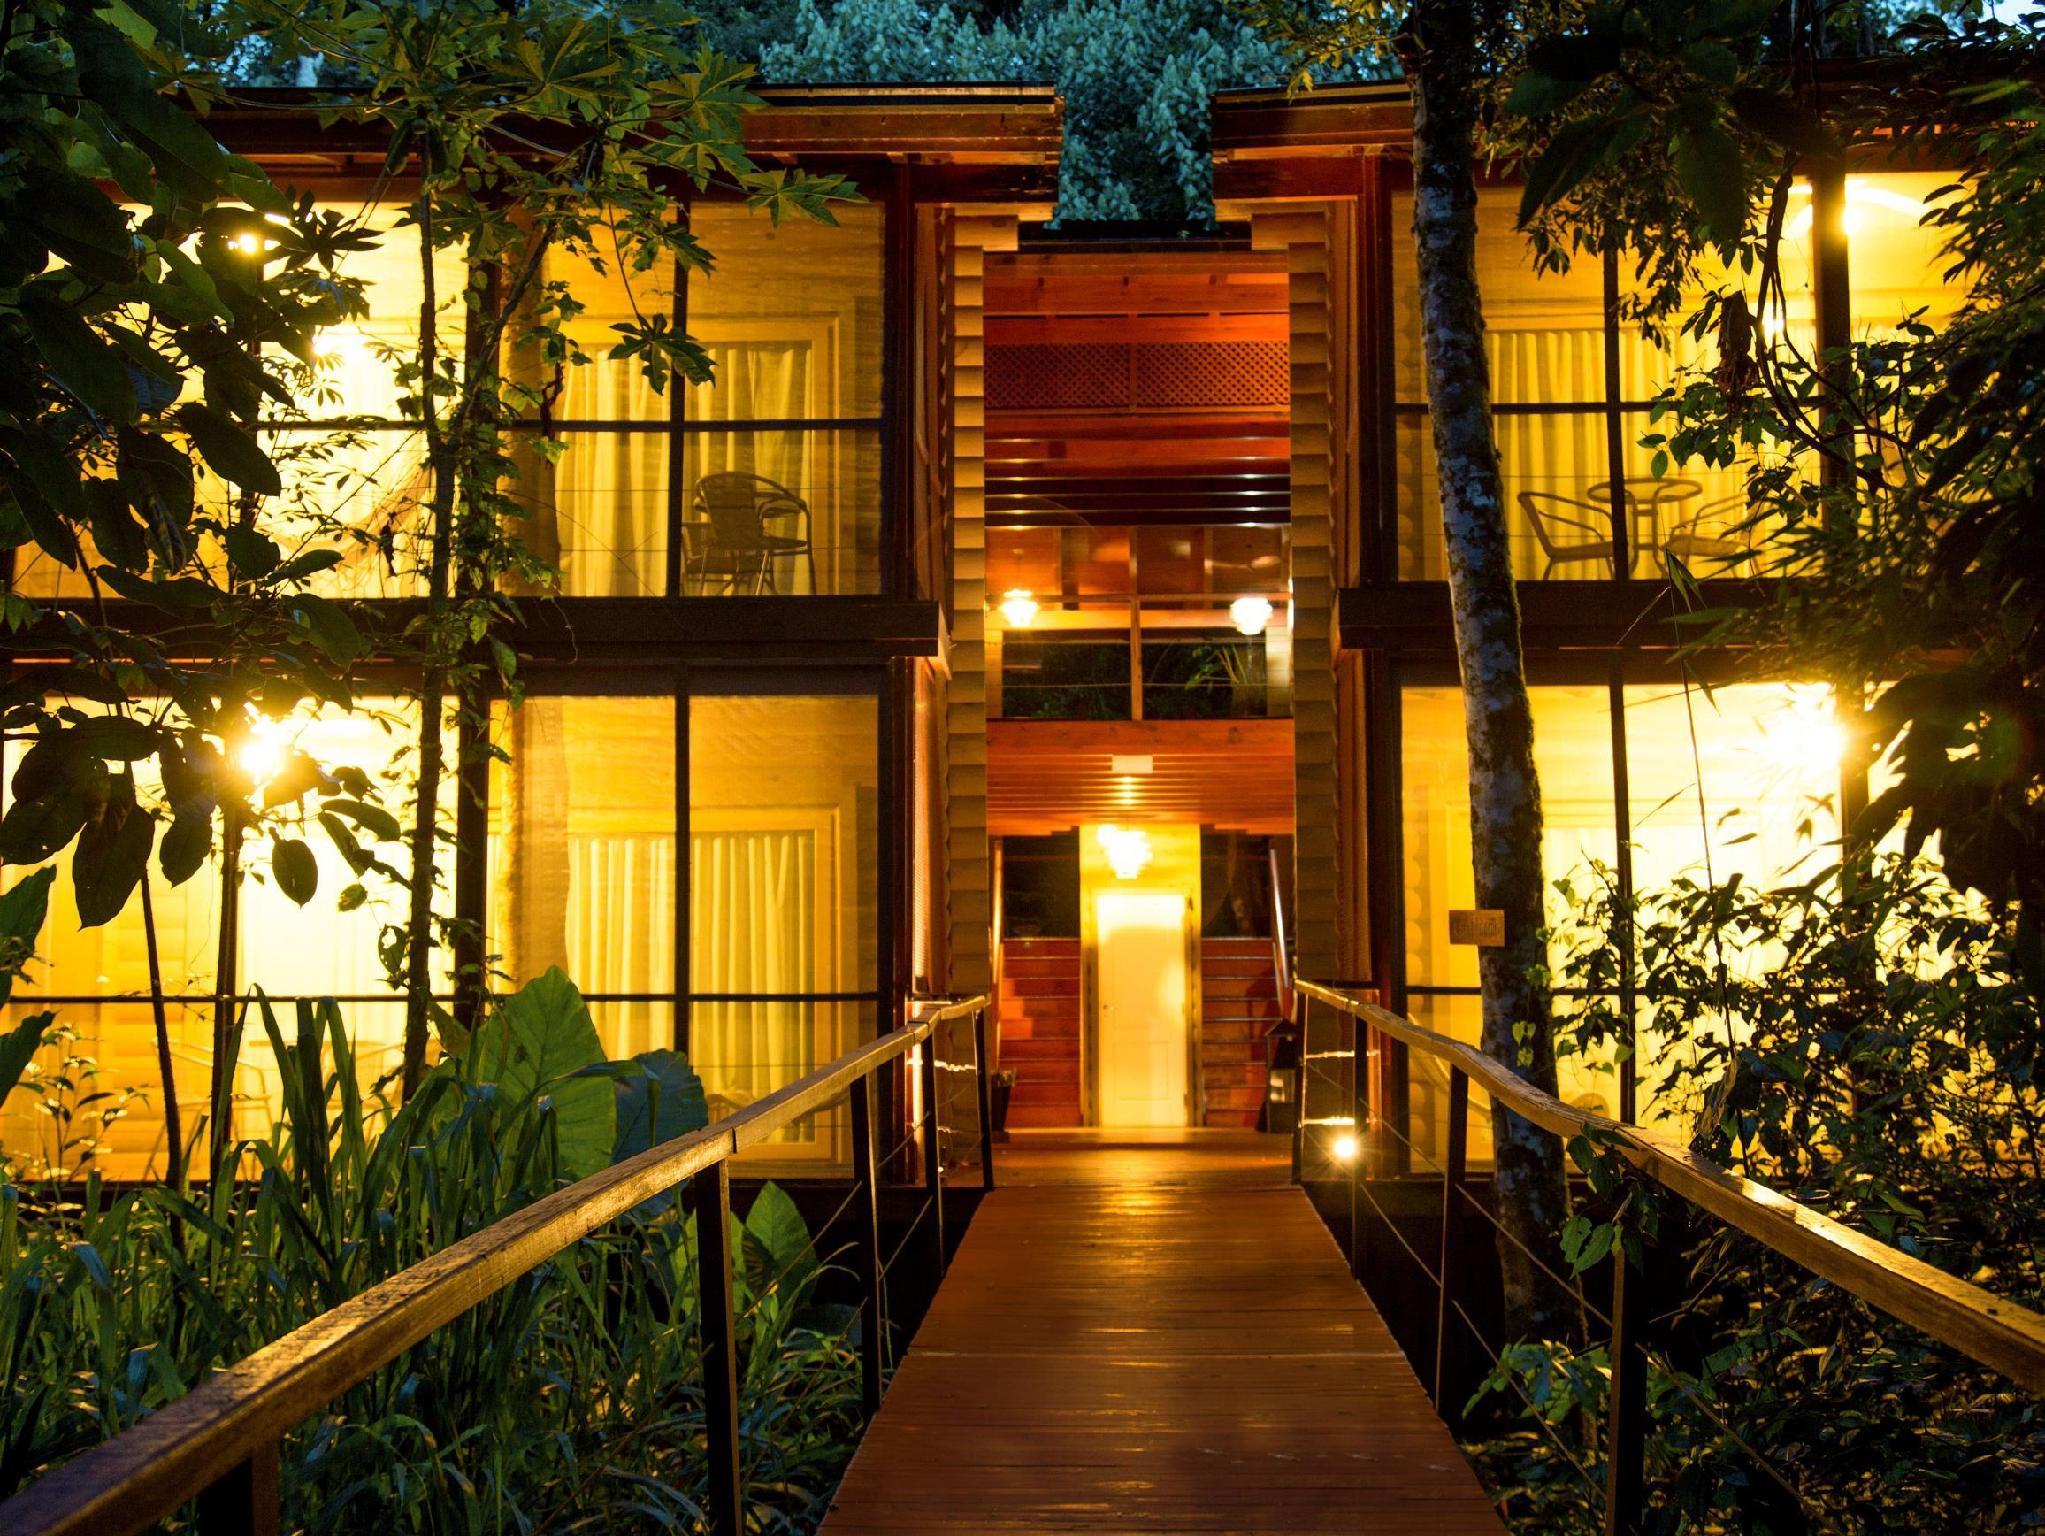 Отель la cantera lodge de selva в пуэрто игуасу от 2879 руб.